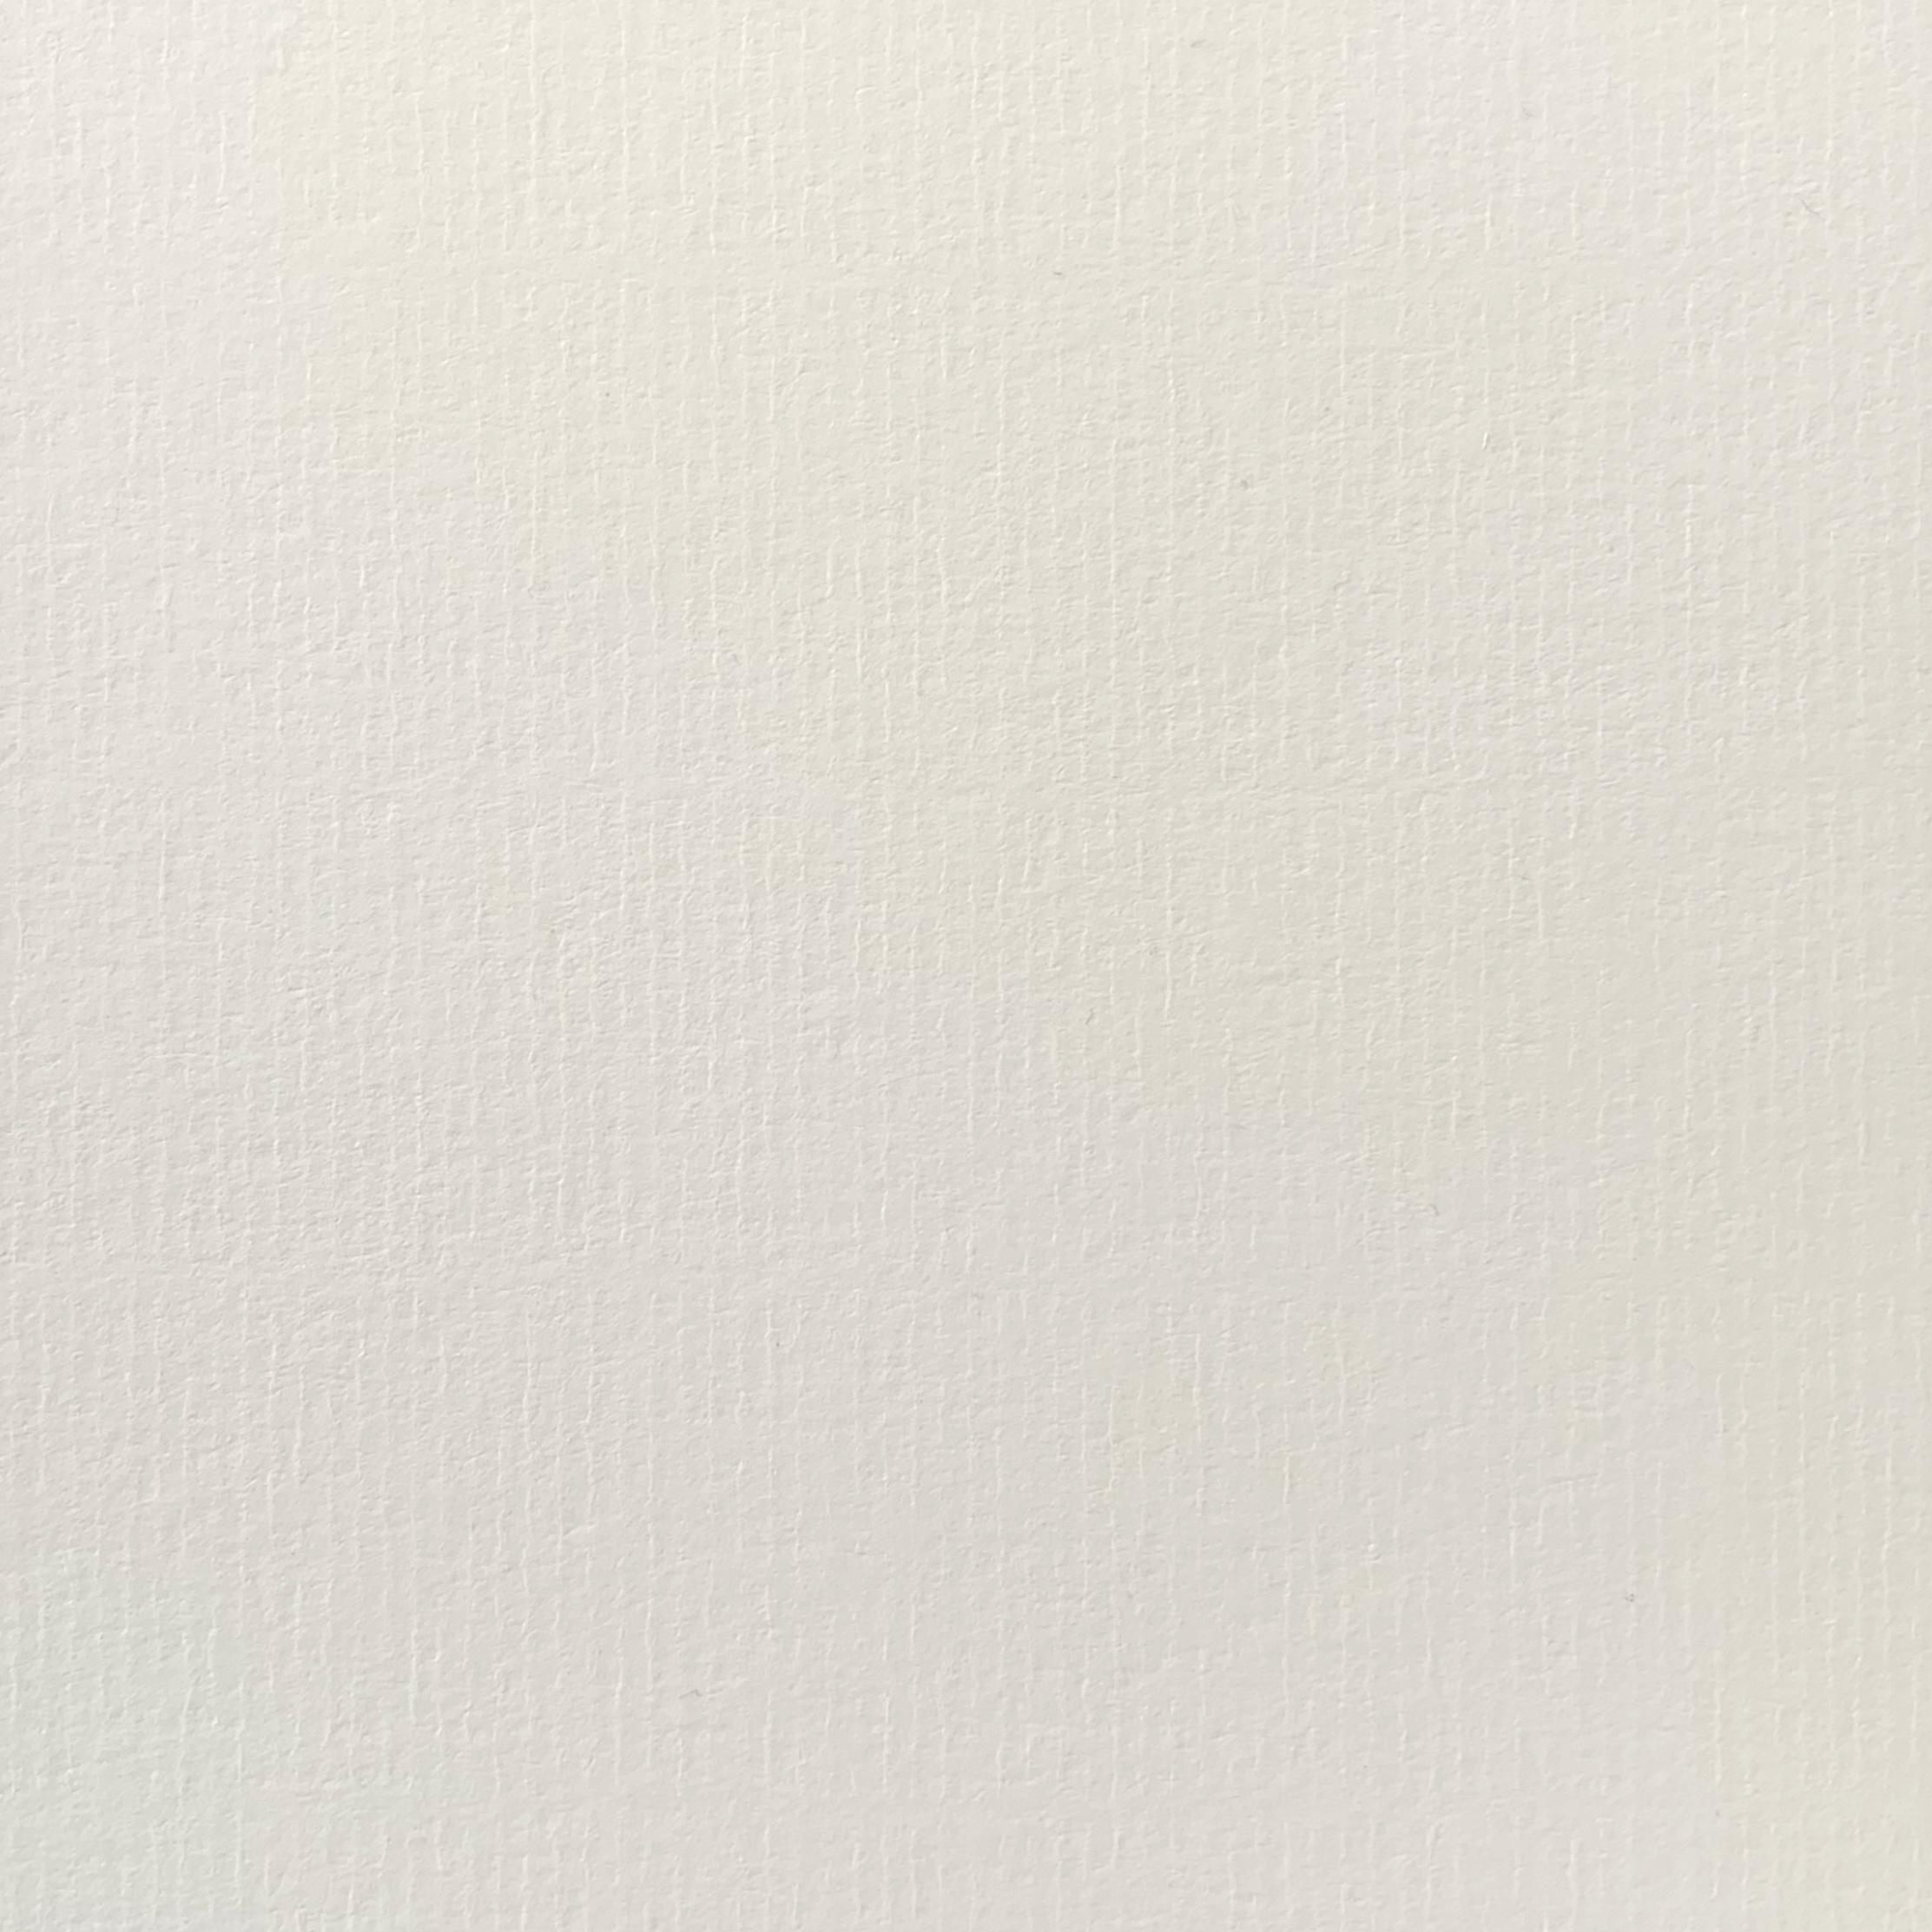 Ivory Textured Cardstock